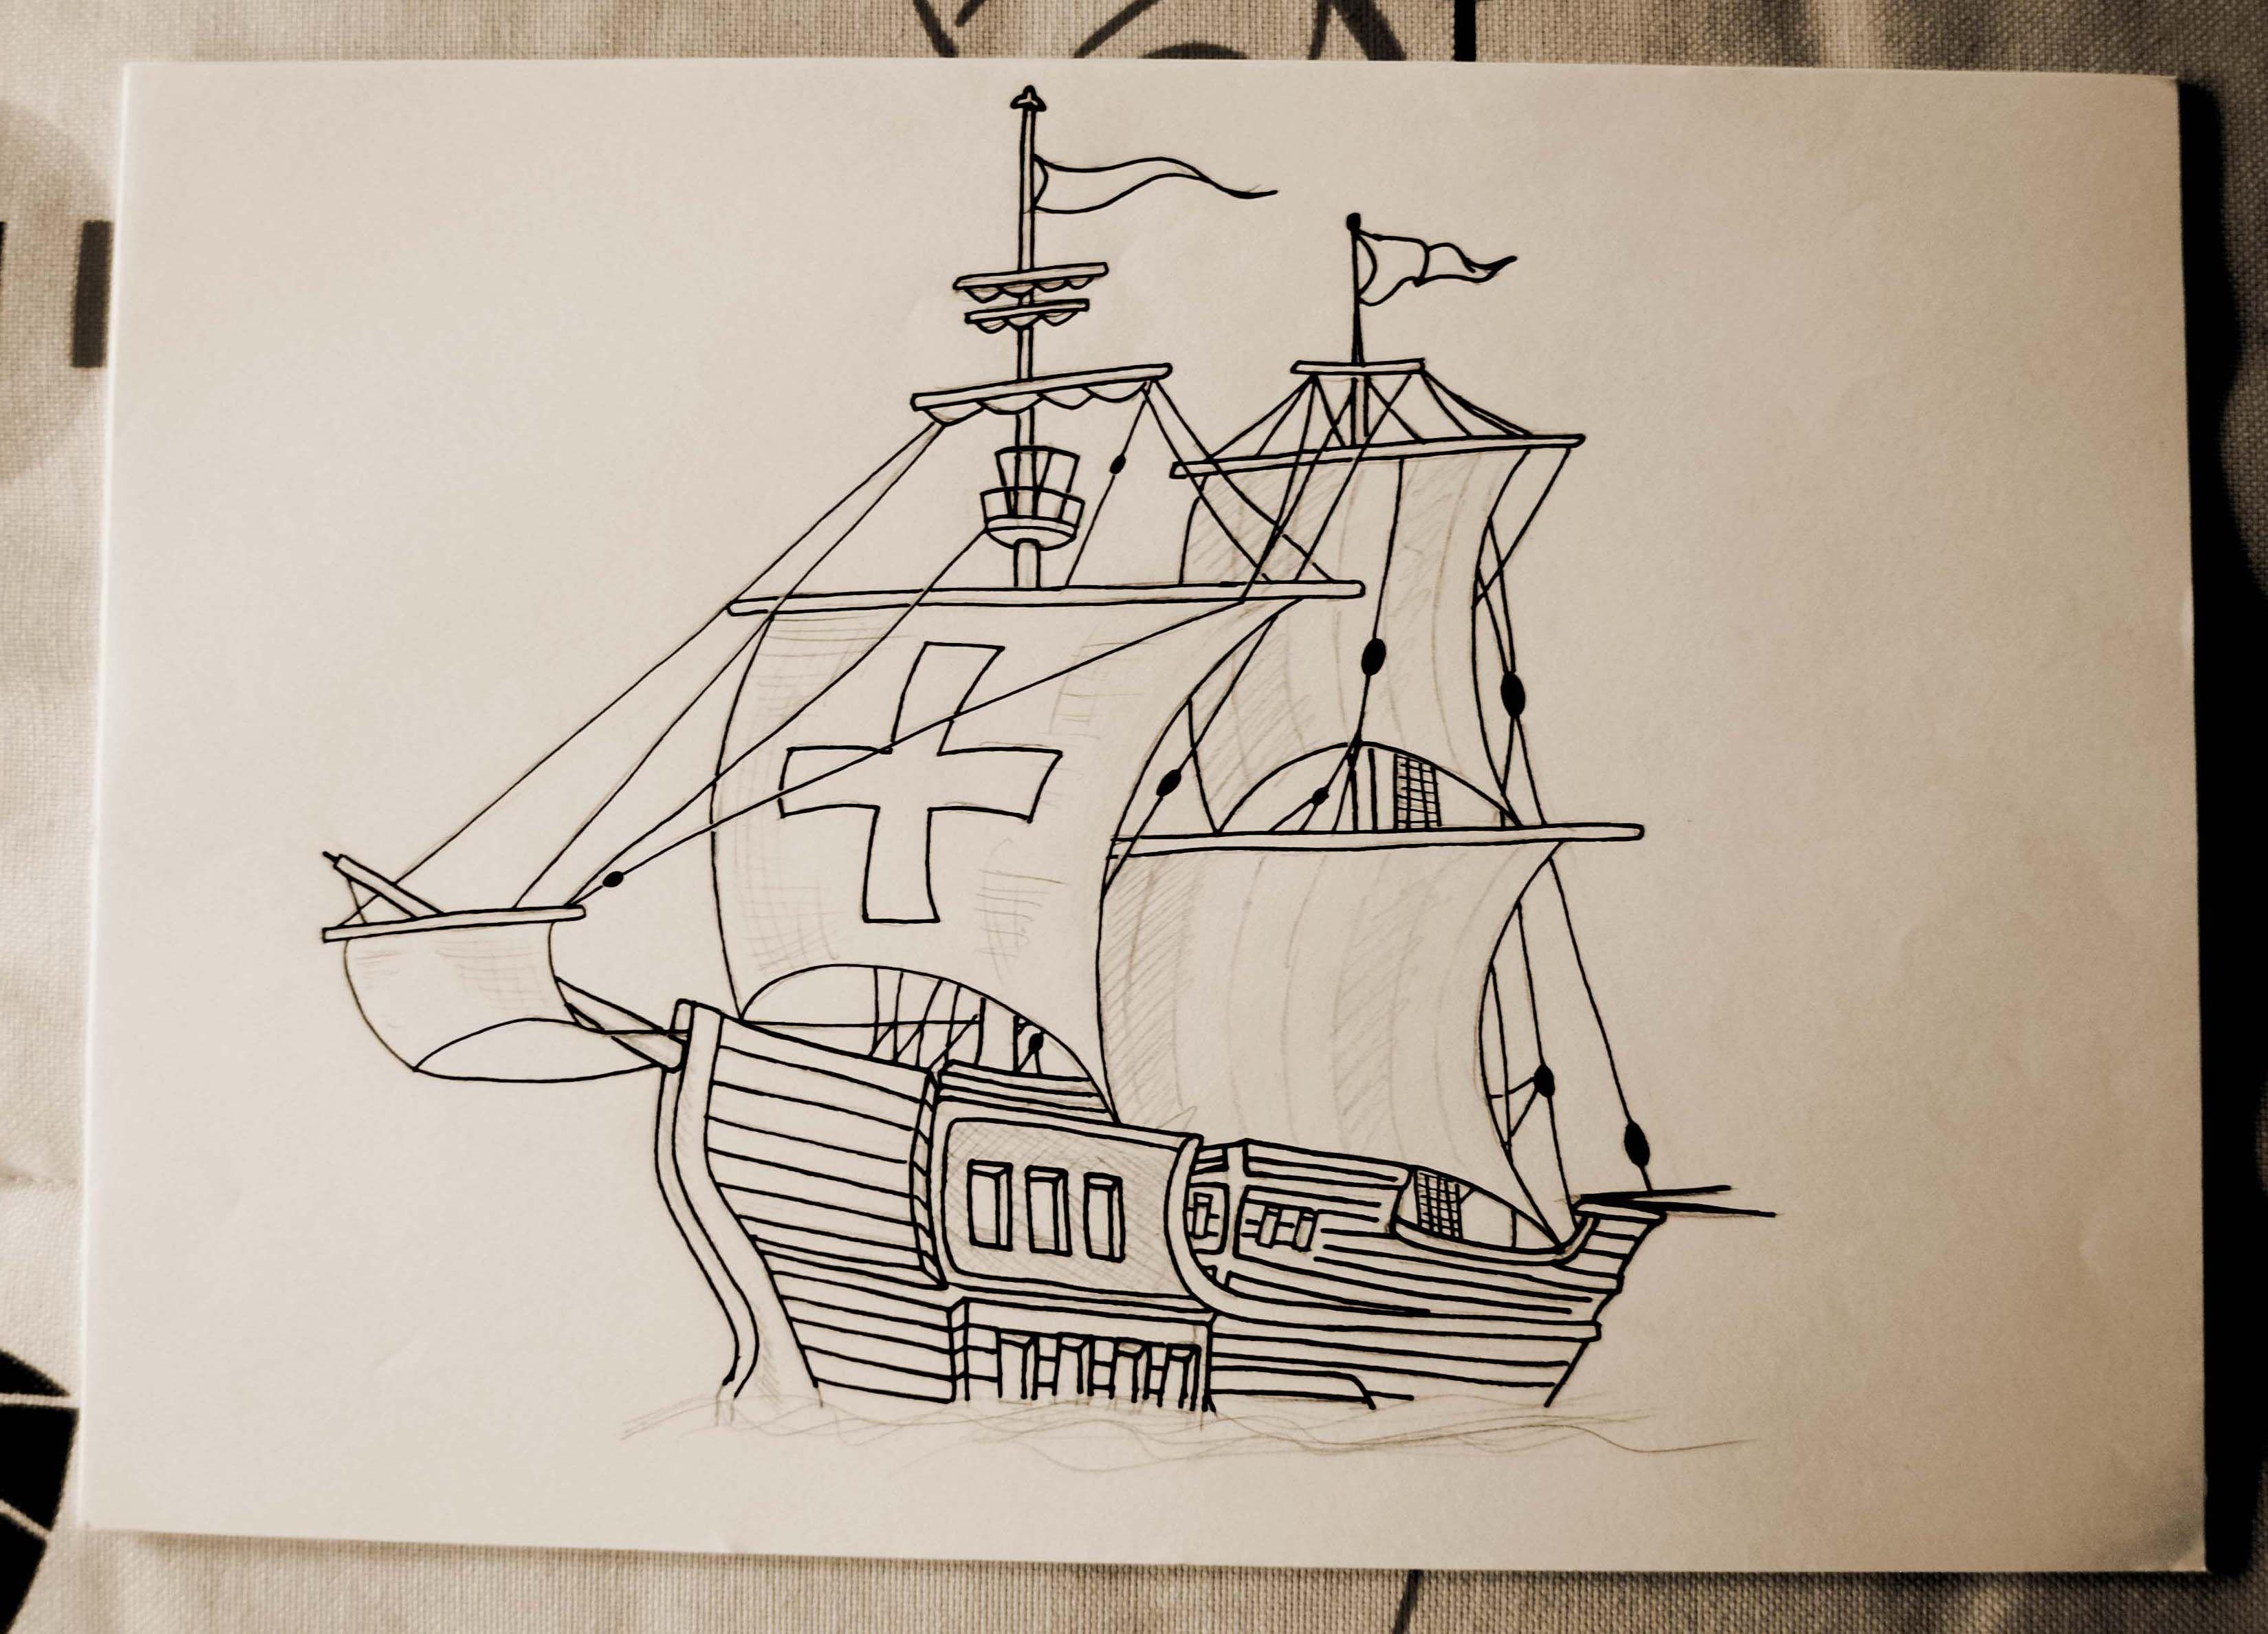 Carabela Ii Caravel Ii Dibujo De Una Carabela Ilustracion De Barcos Y Piratas A Lapiz Y Estilografica Drawing Of A Caravel Illustr Drawings Painting Art